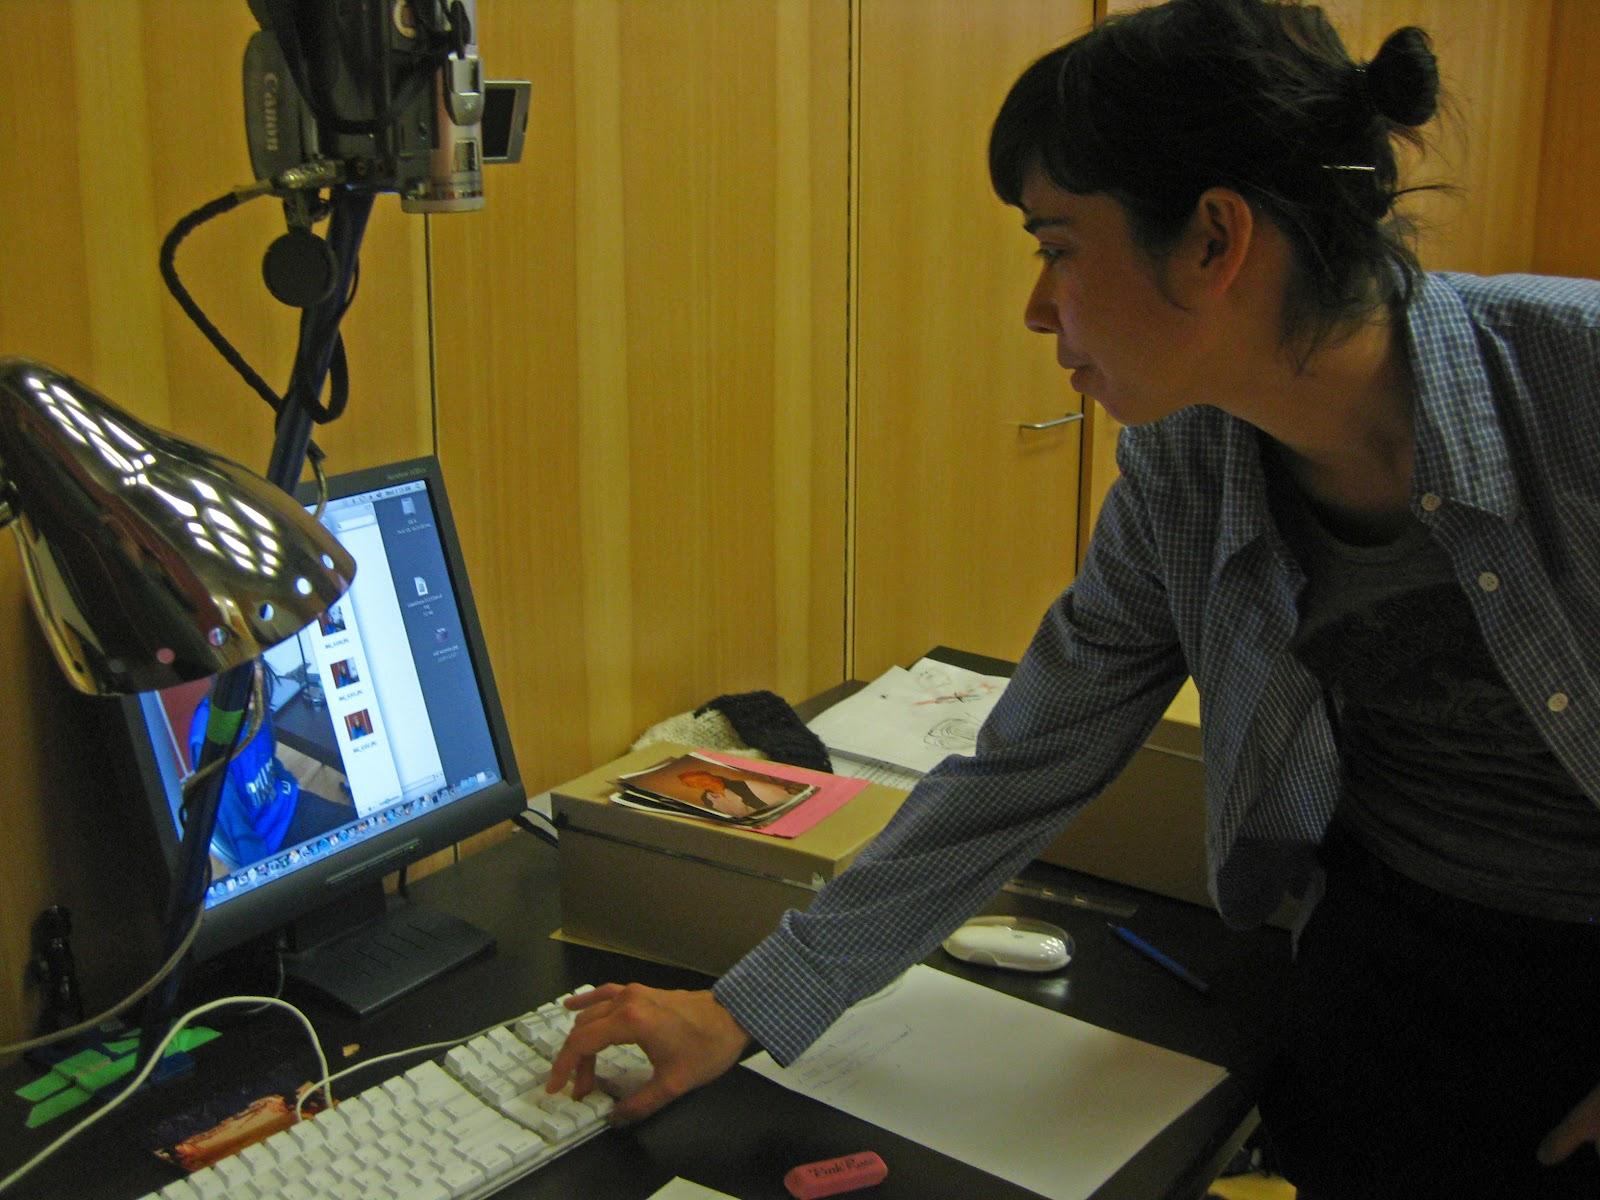 Catrina Longmuir checks the settings